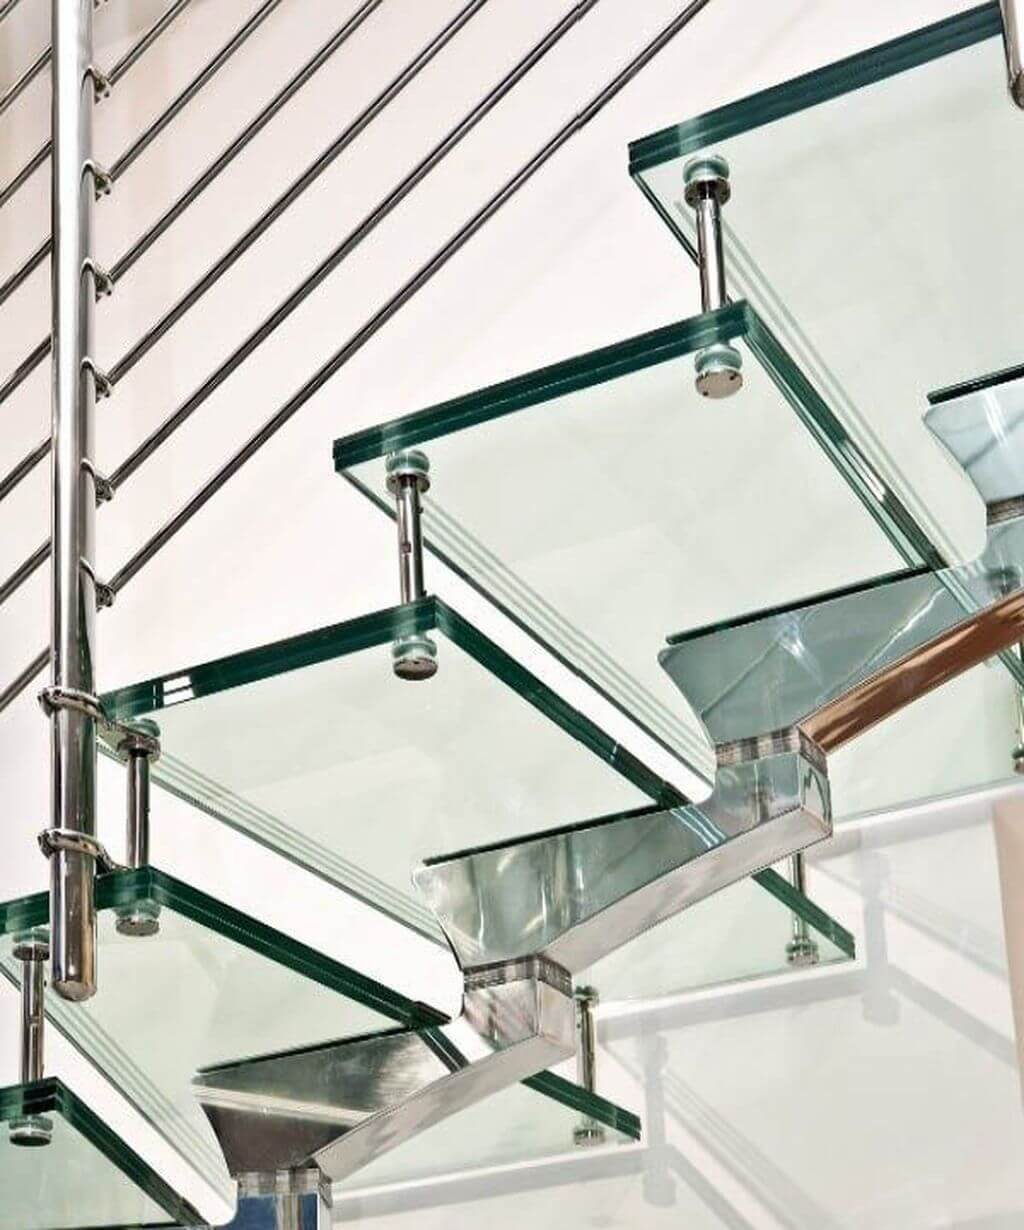 cam-basamaklı-merdiven (2)